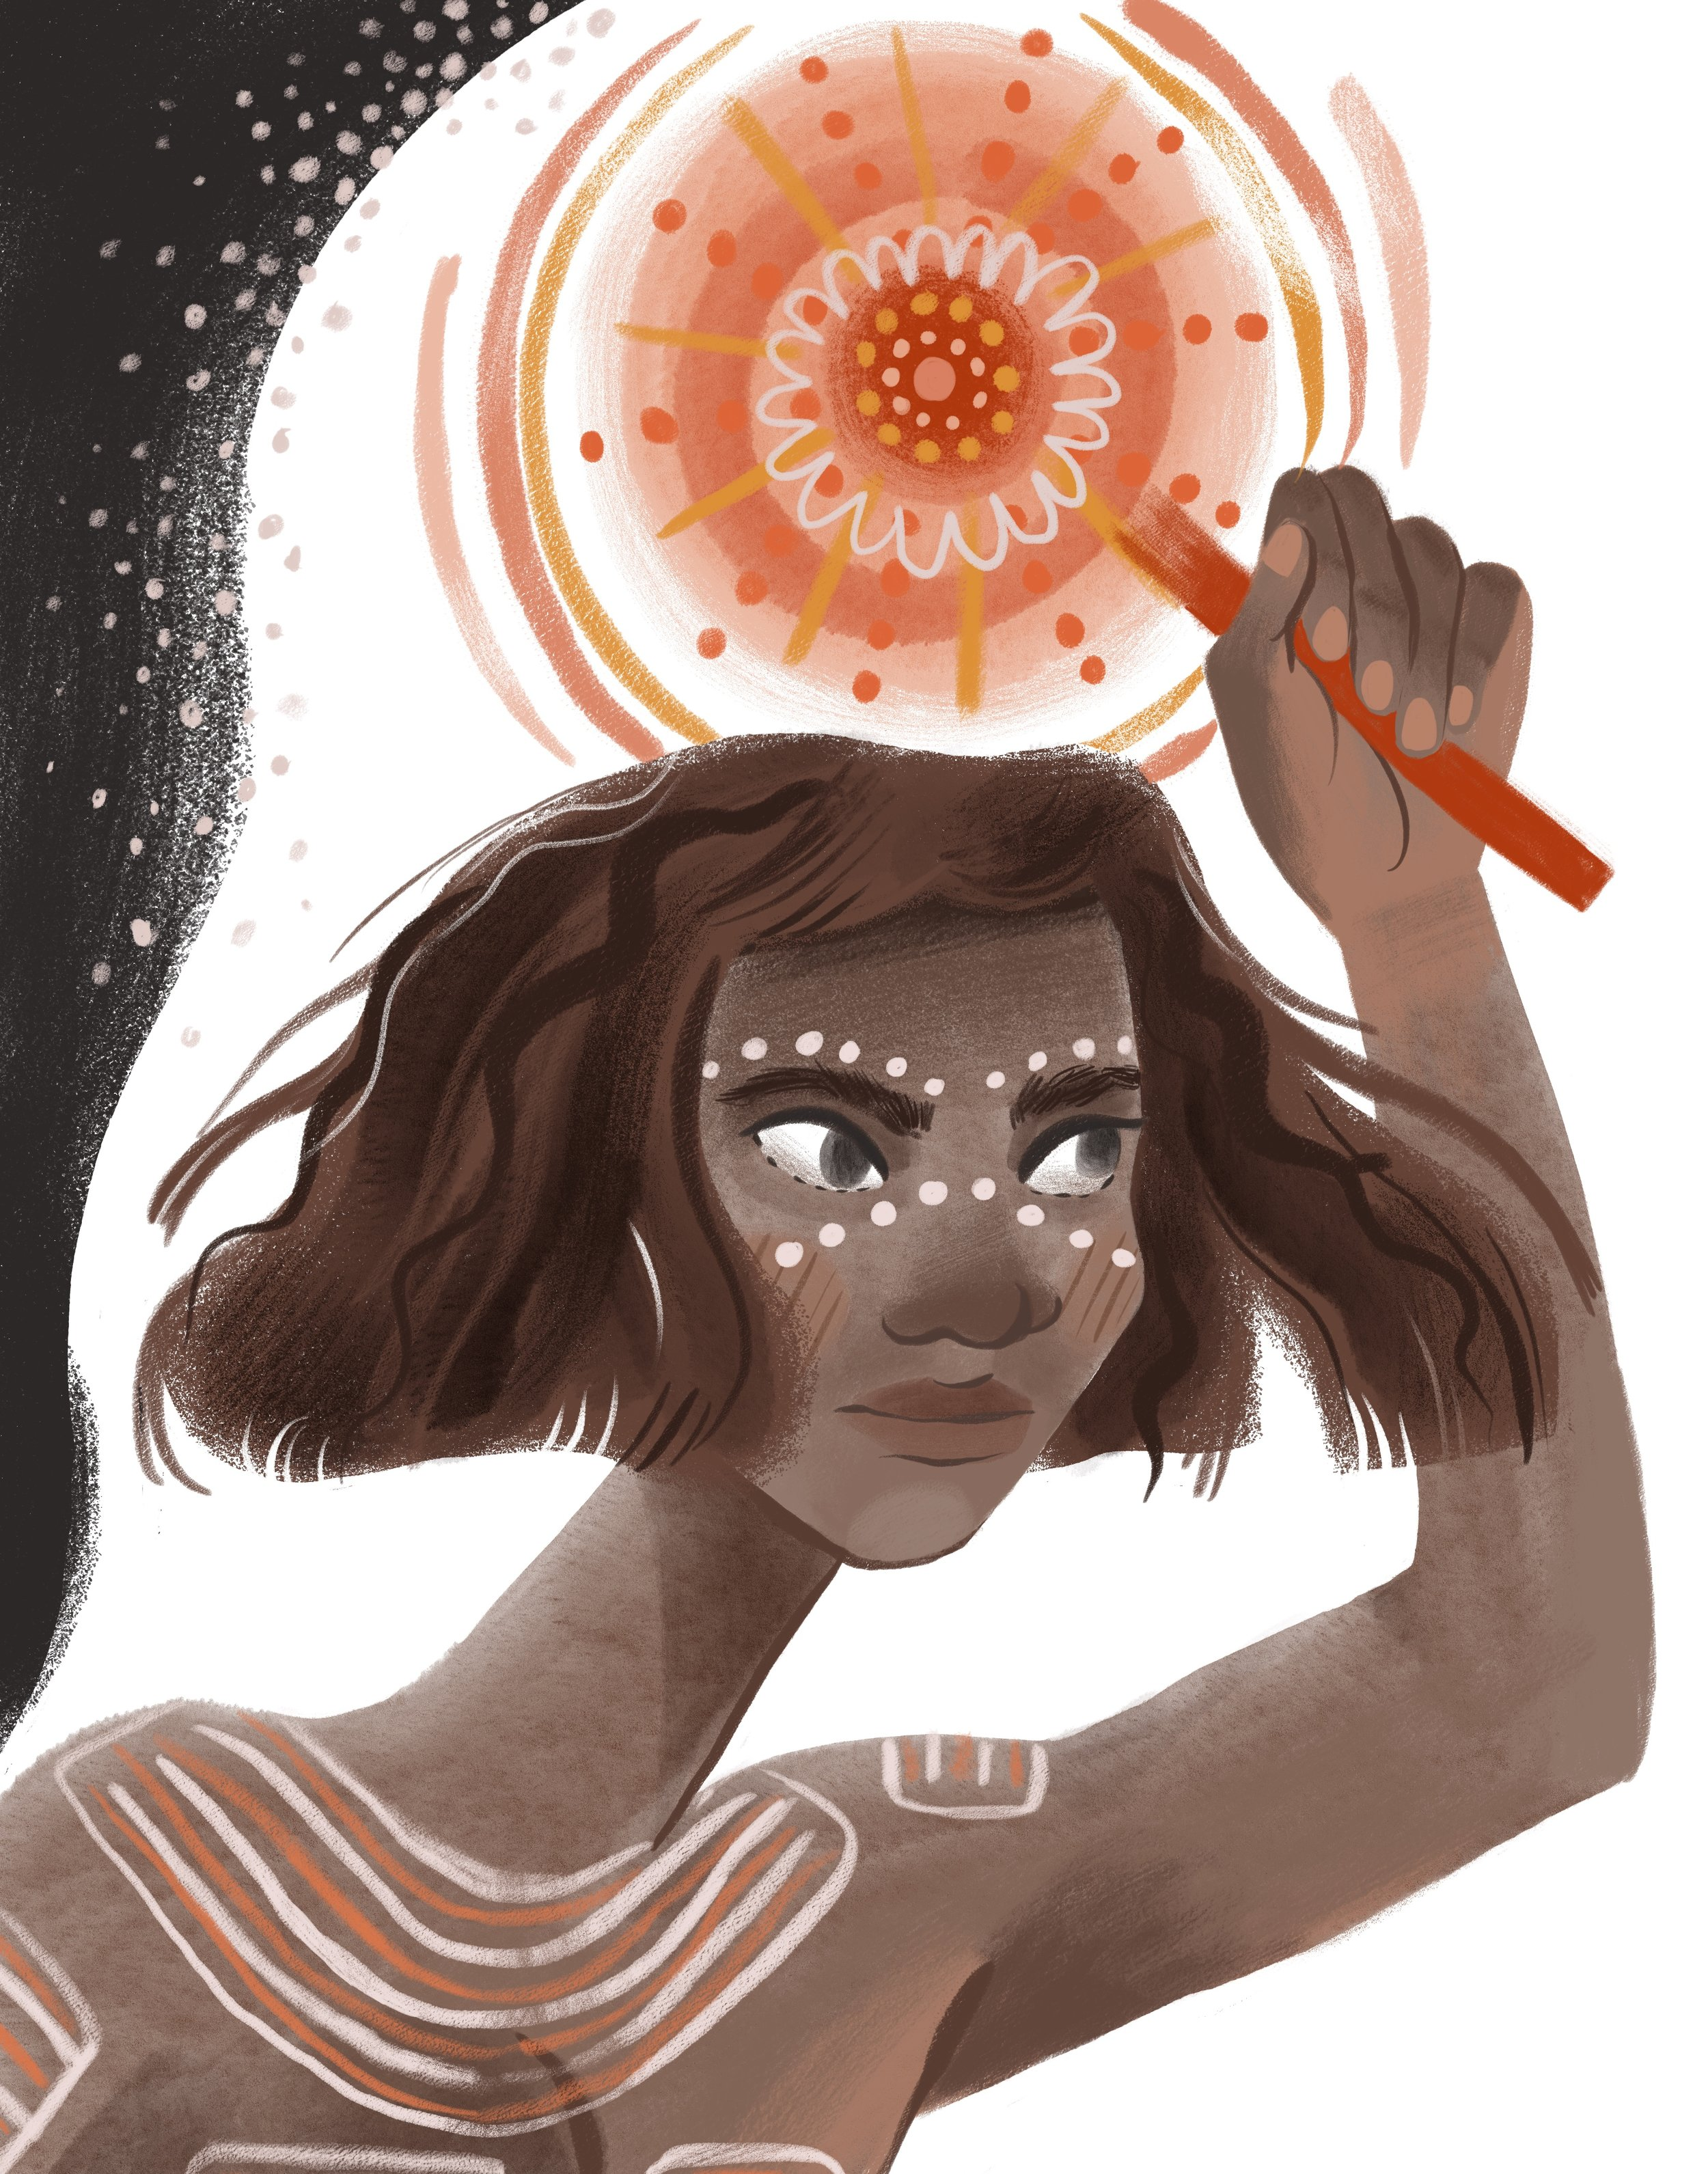 Gnowee_Australian_Aboriginal_Solar_Goddess.jpg